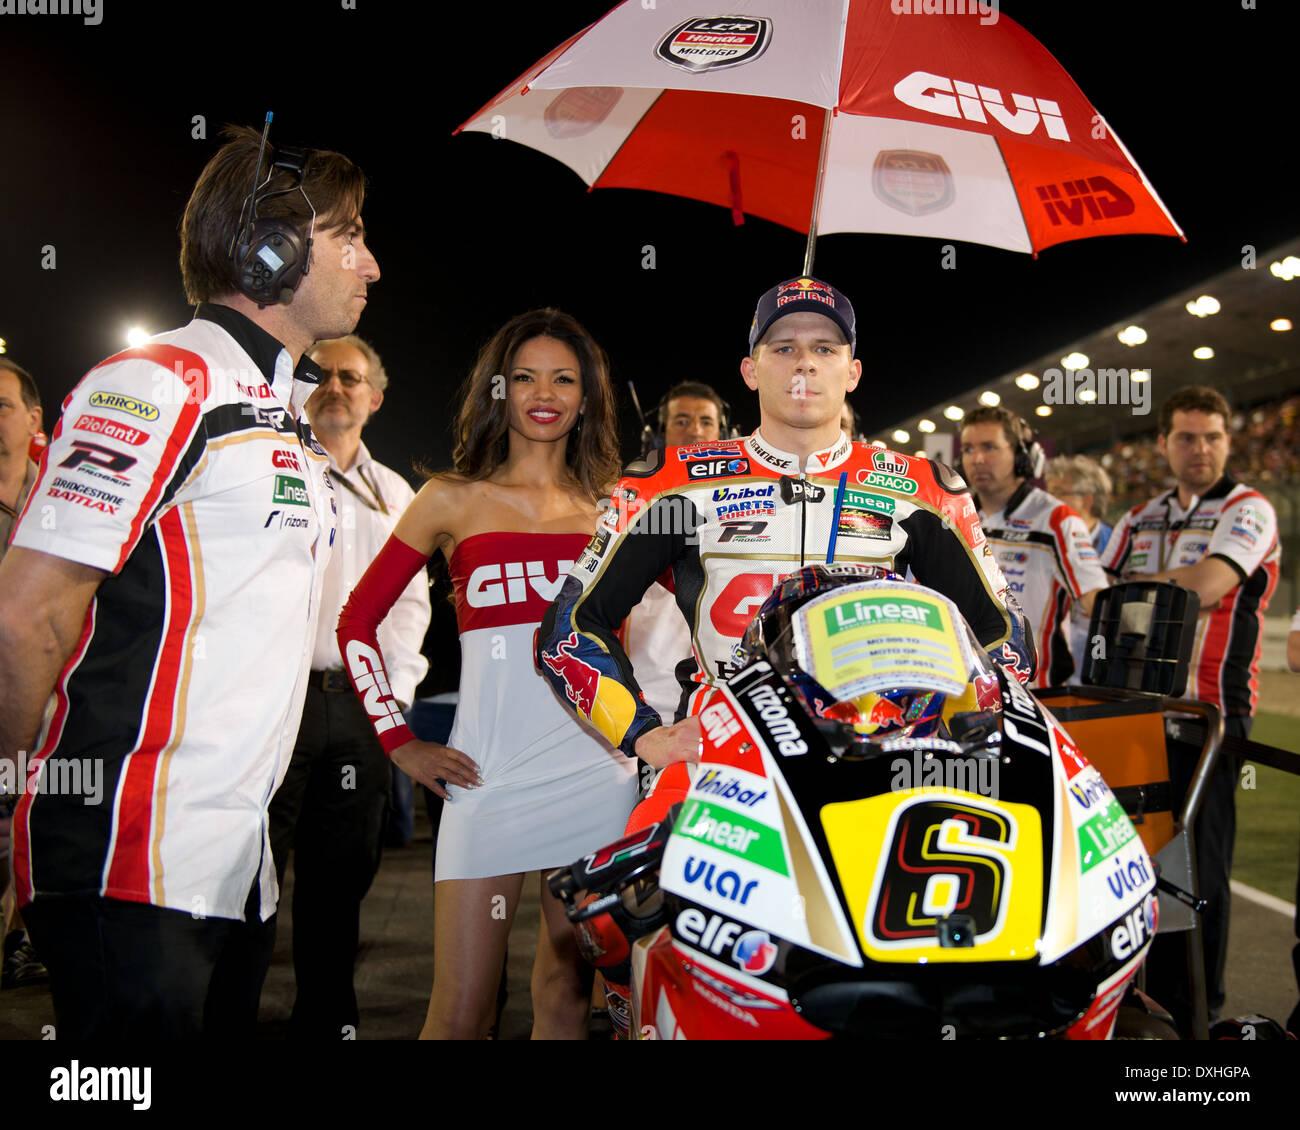 Losail International Circuit, Katar.  MotoGP-Fahrer warten auf Start Raster Stockfoto